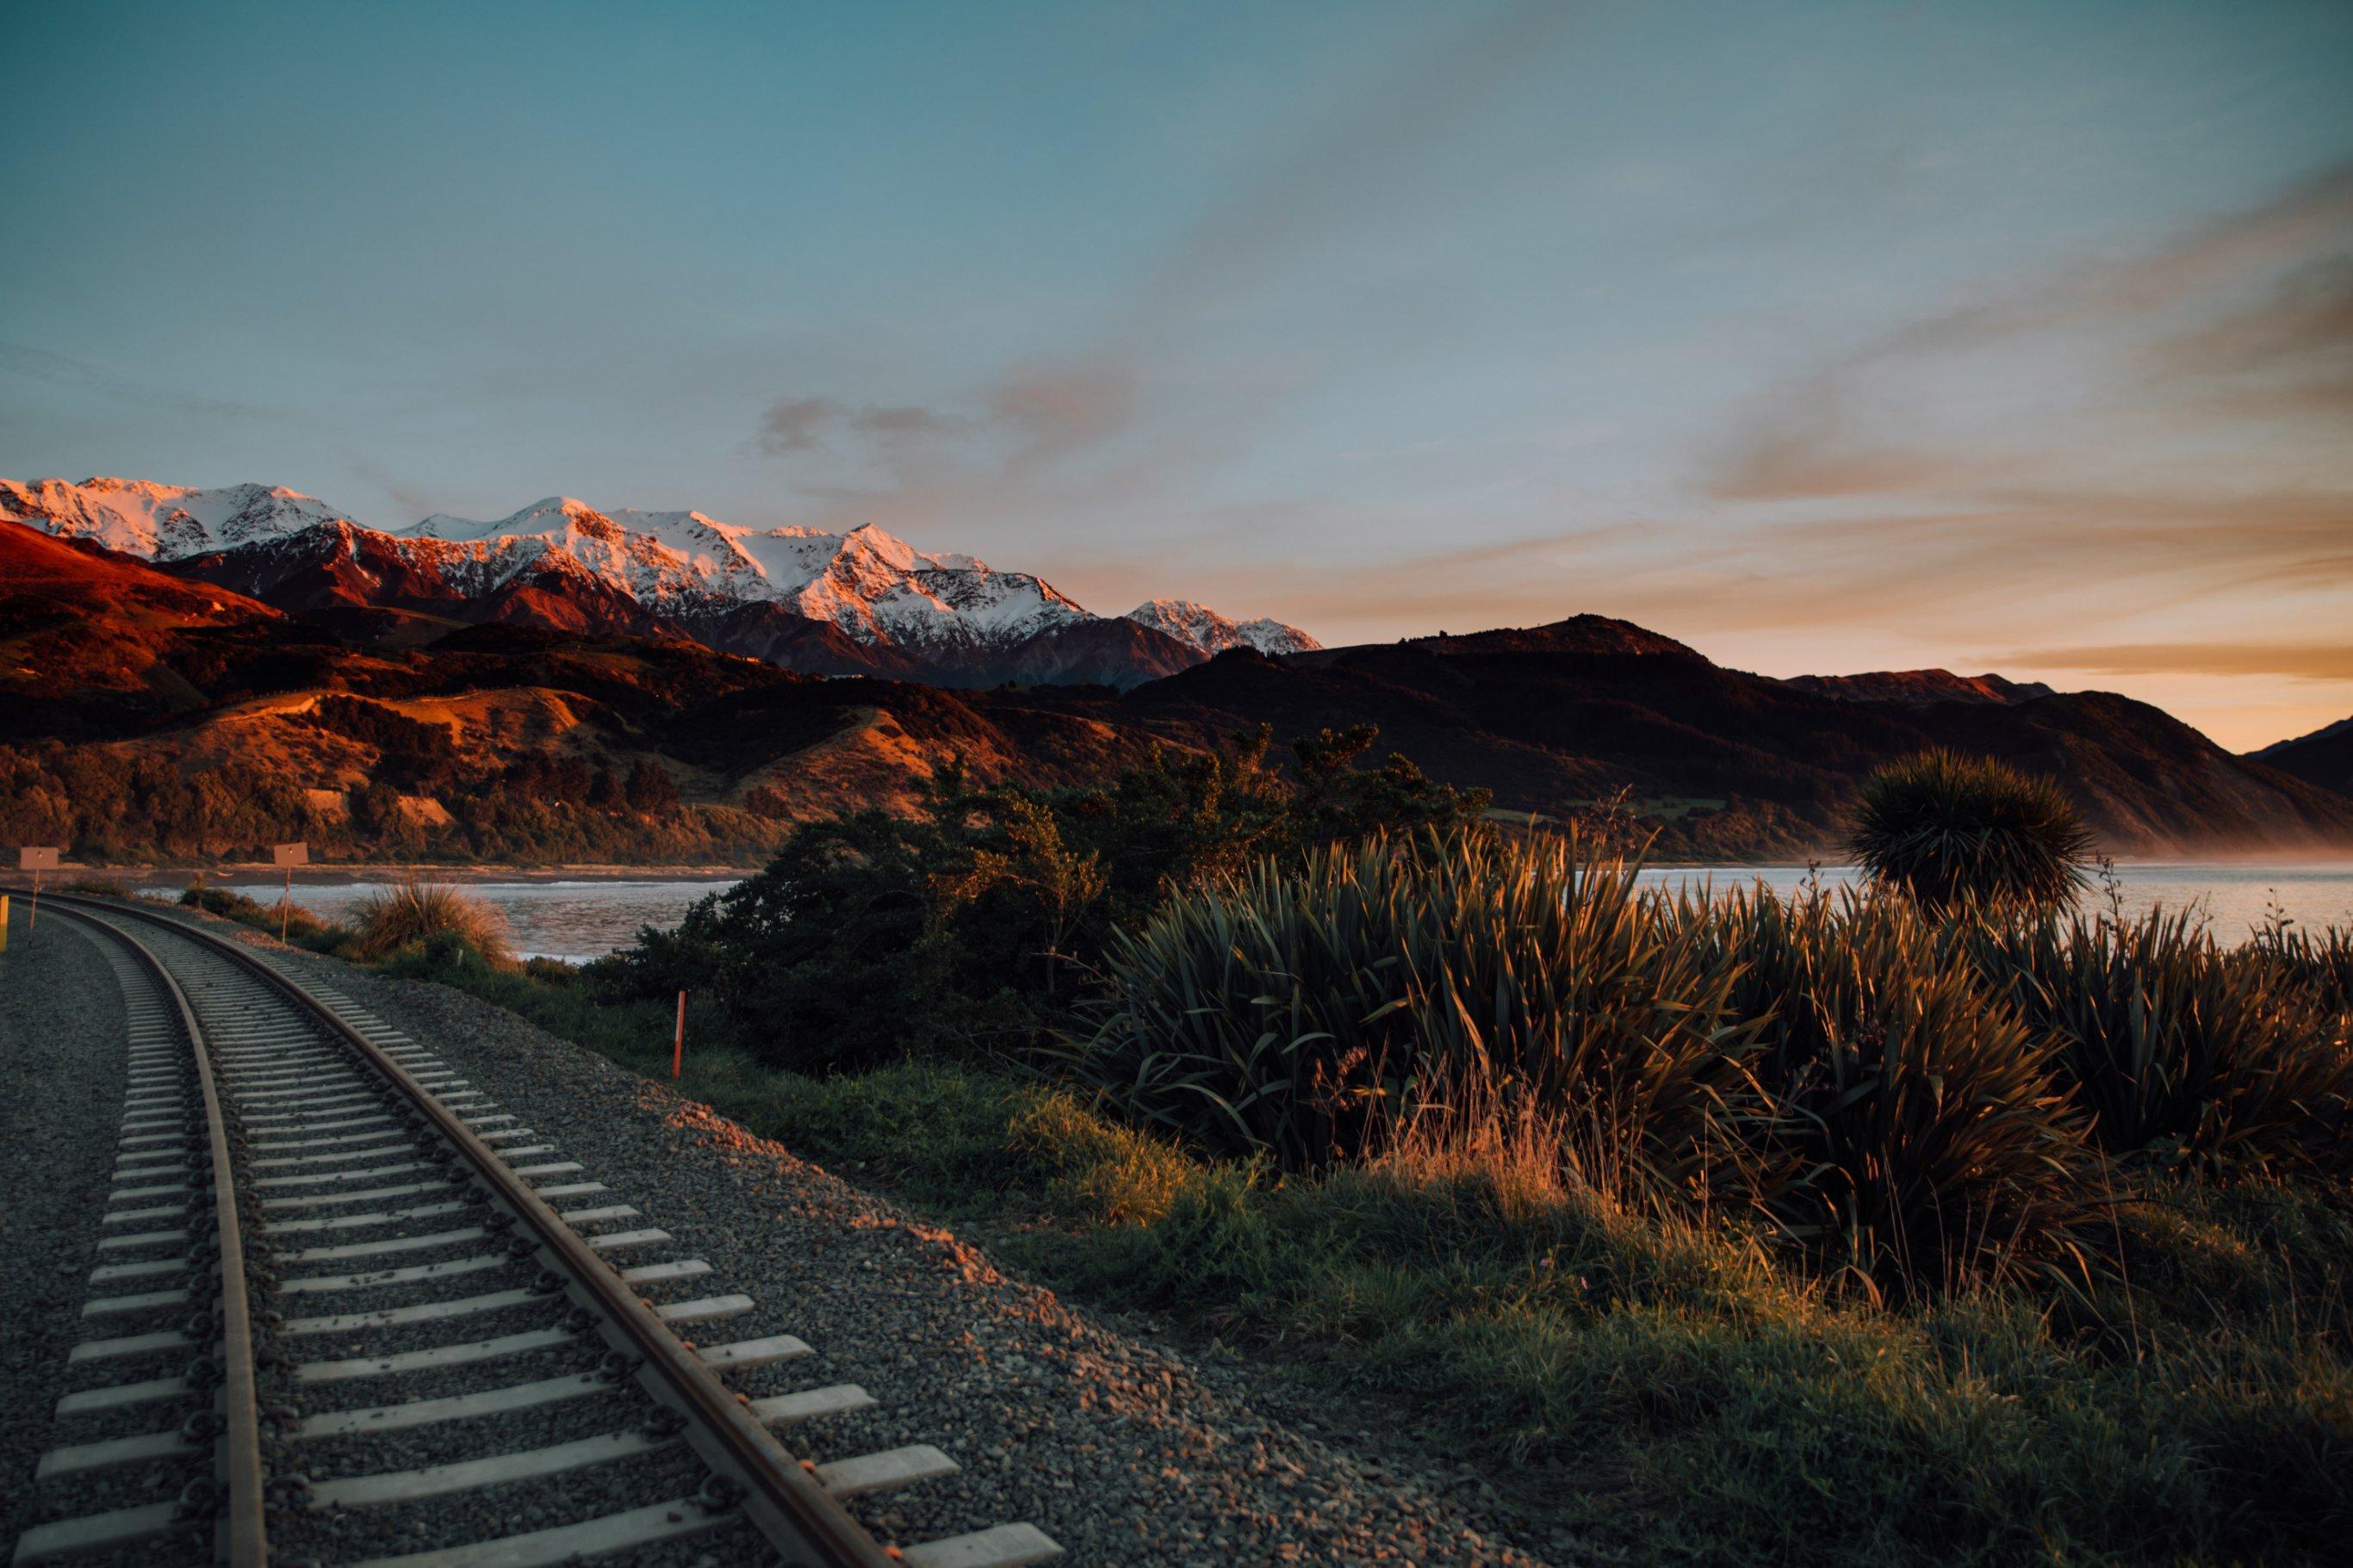 16-Day Scenic Train Holiday in New Zealand - New Zealand Itinerary